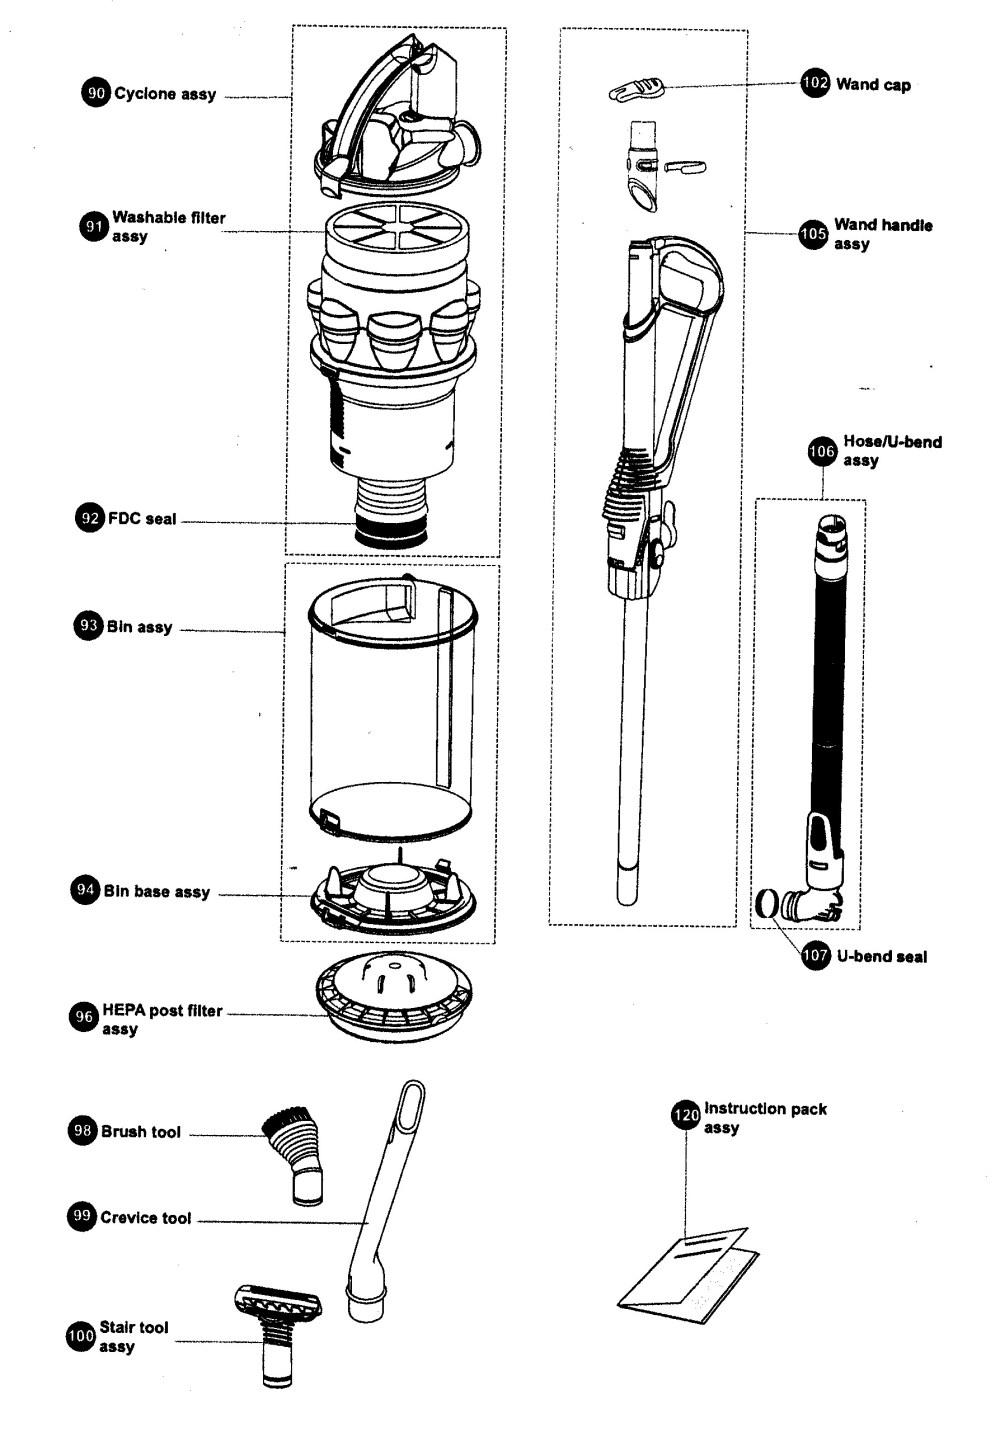 medium resolution of dyson dc25 parts diagram dyson vacuum diagram google search evolo pinterest of dyson dc25 parts diagram